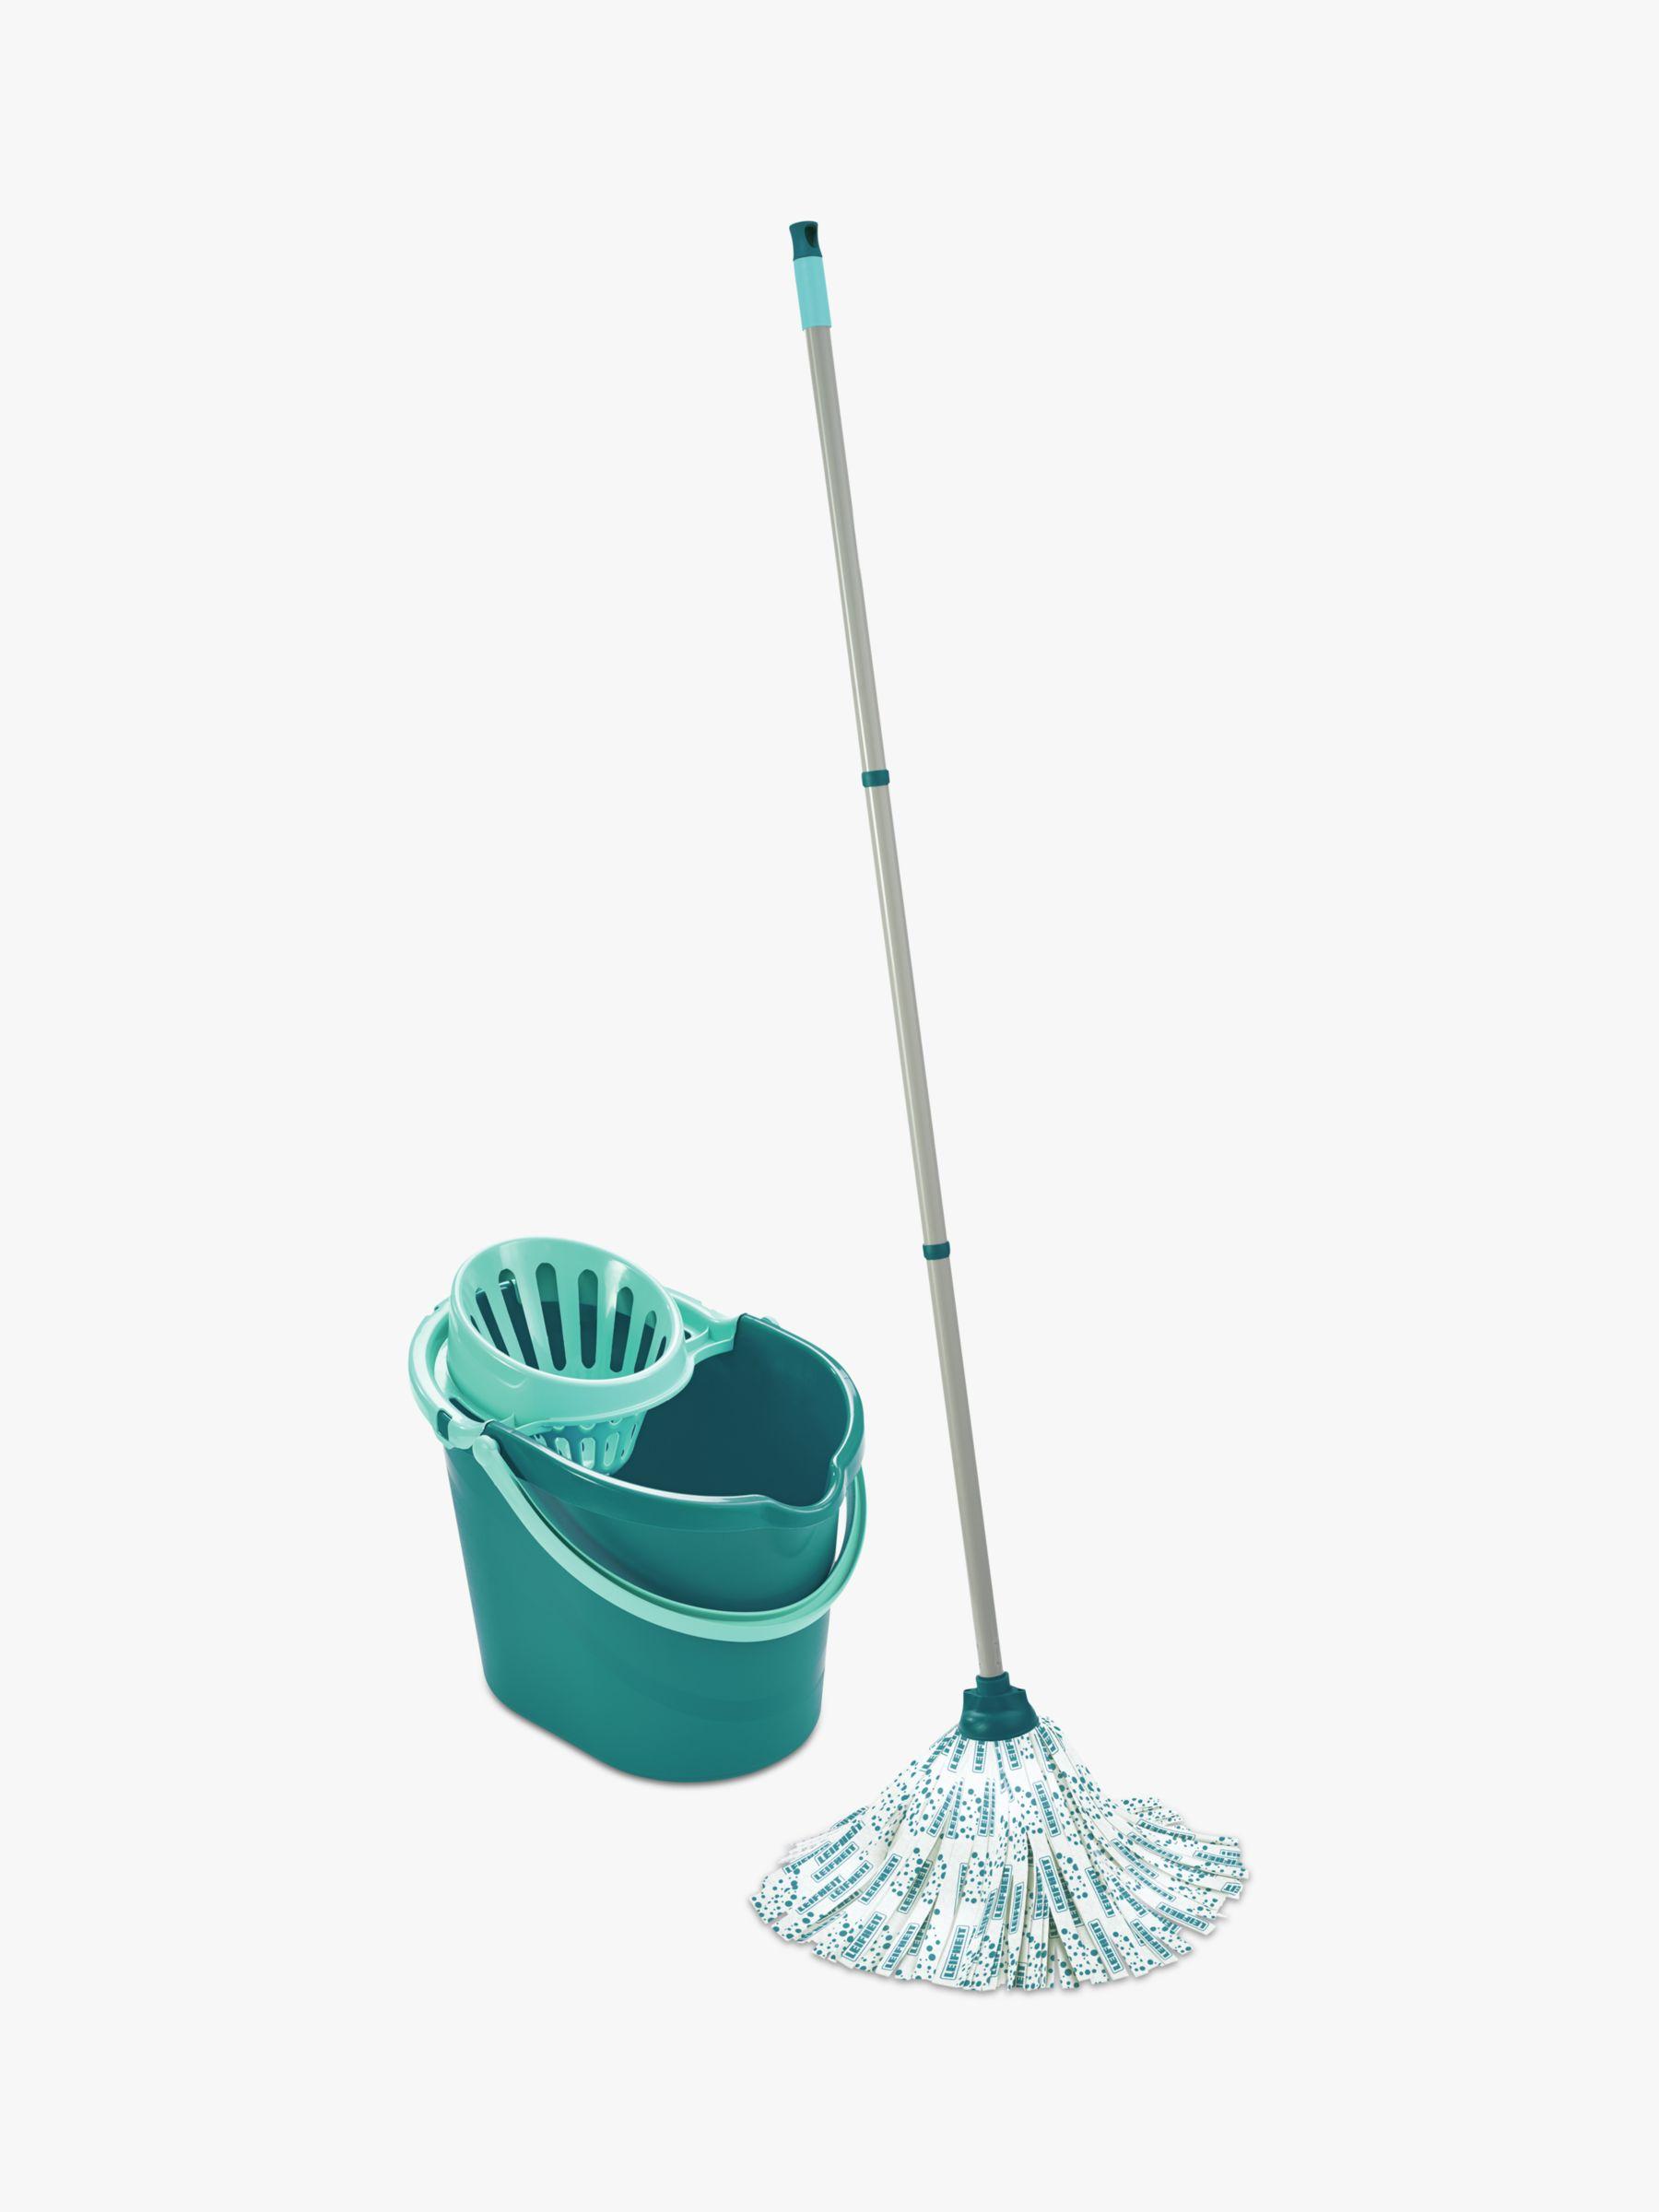 a91ef1d182d2 Leifheit Classic Mop and Bucket Set at John Lewis & Partners